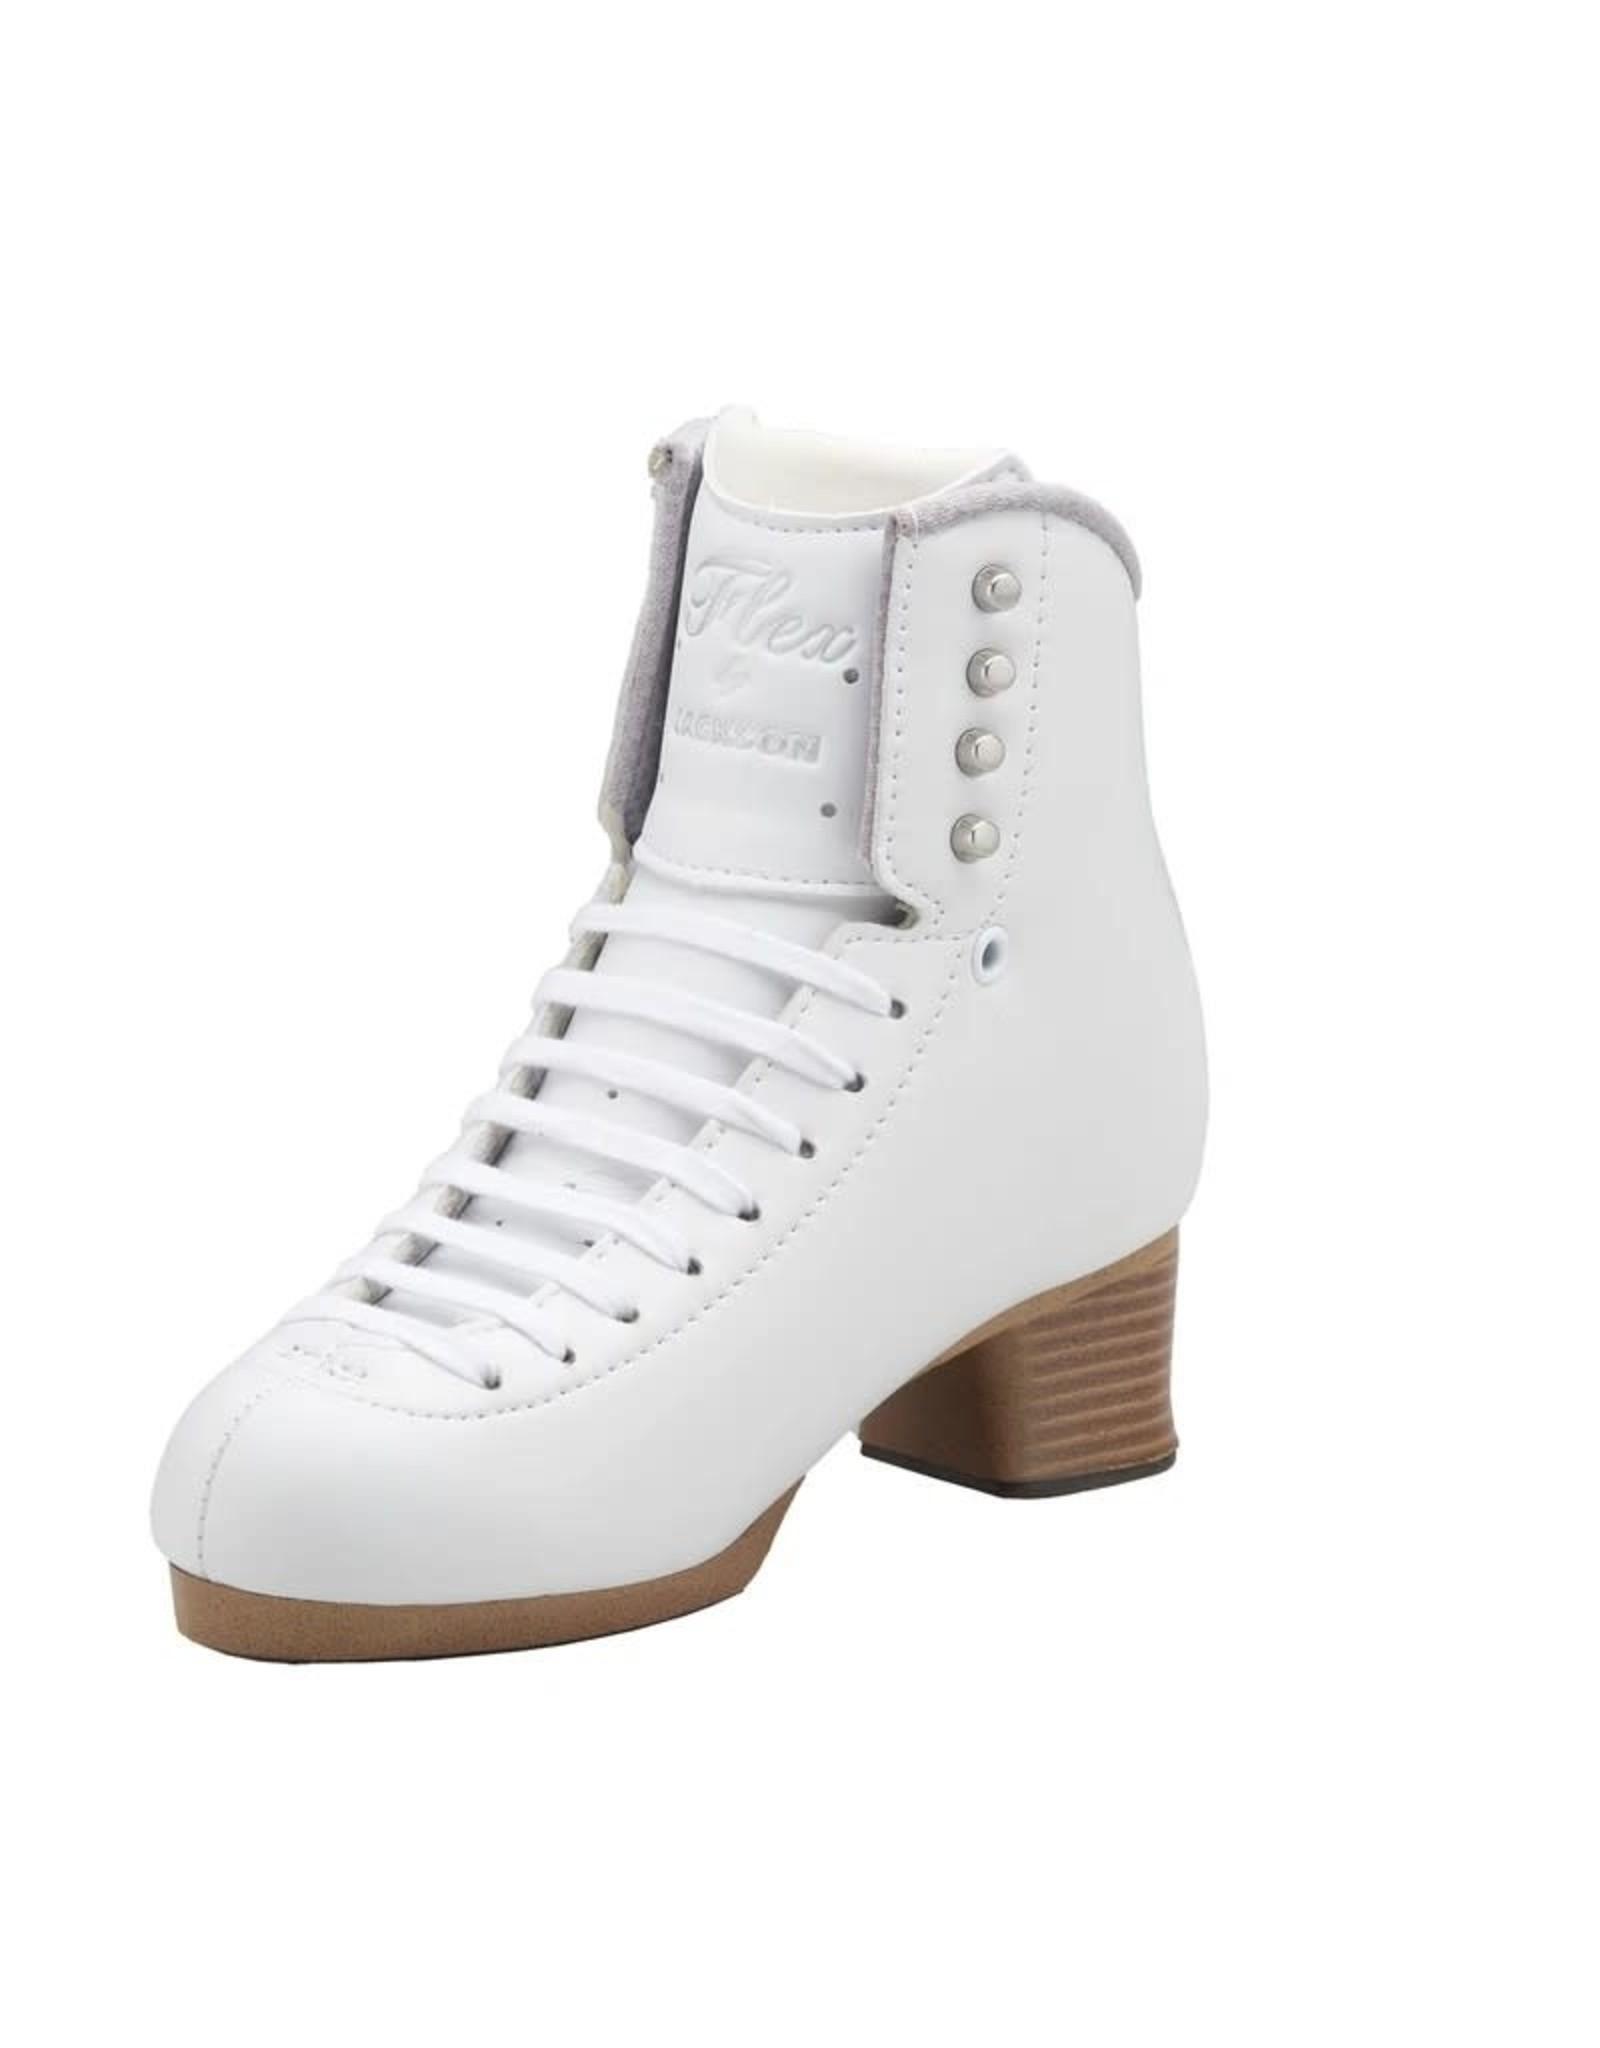 Jackson Figure skates Flex FS2000